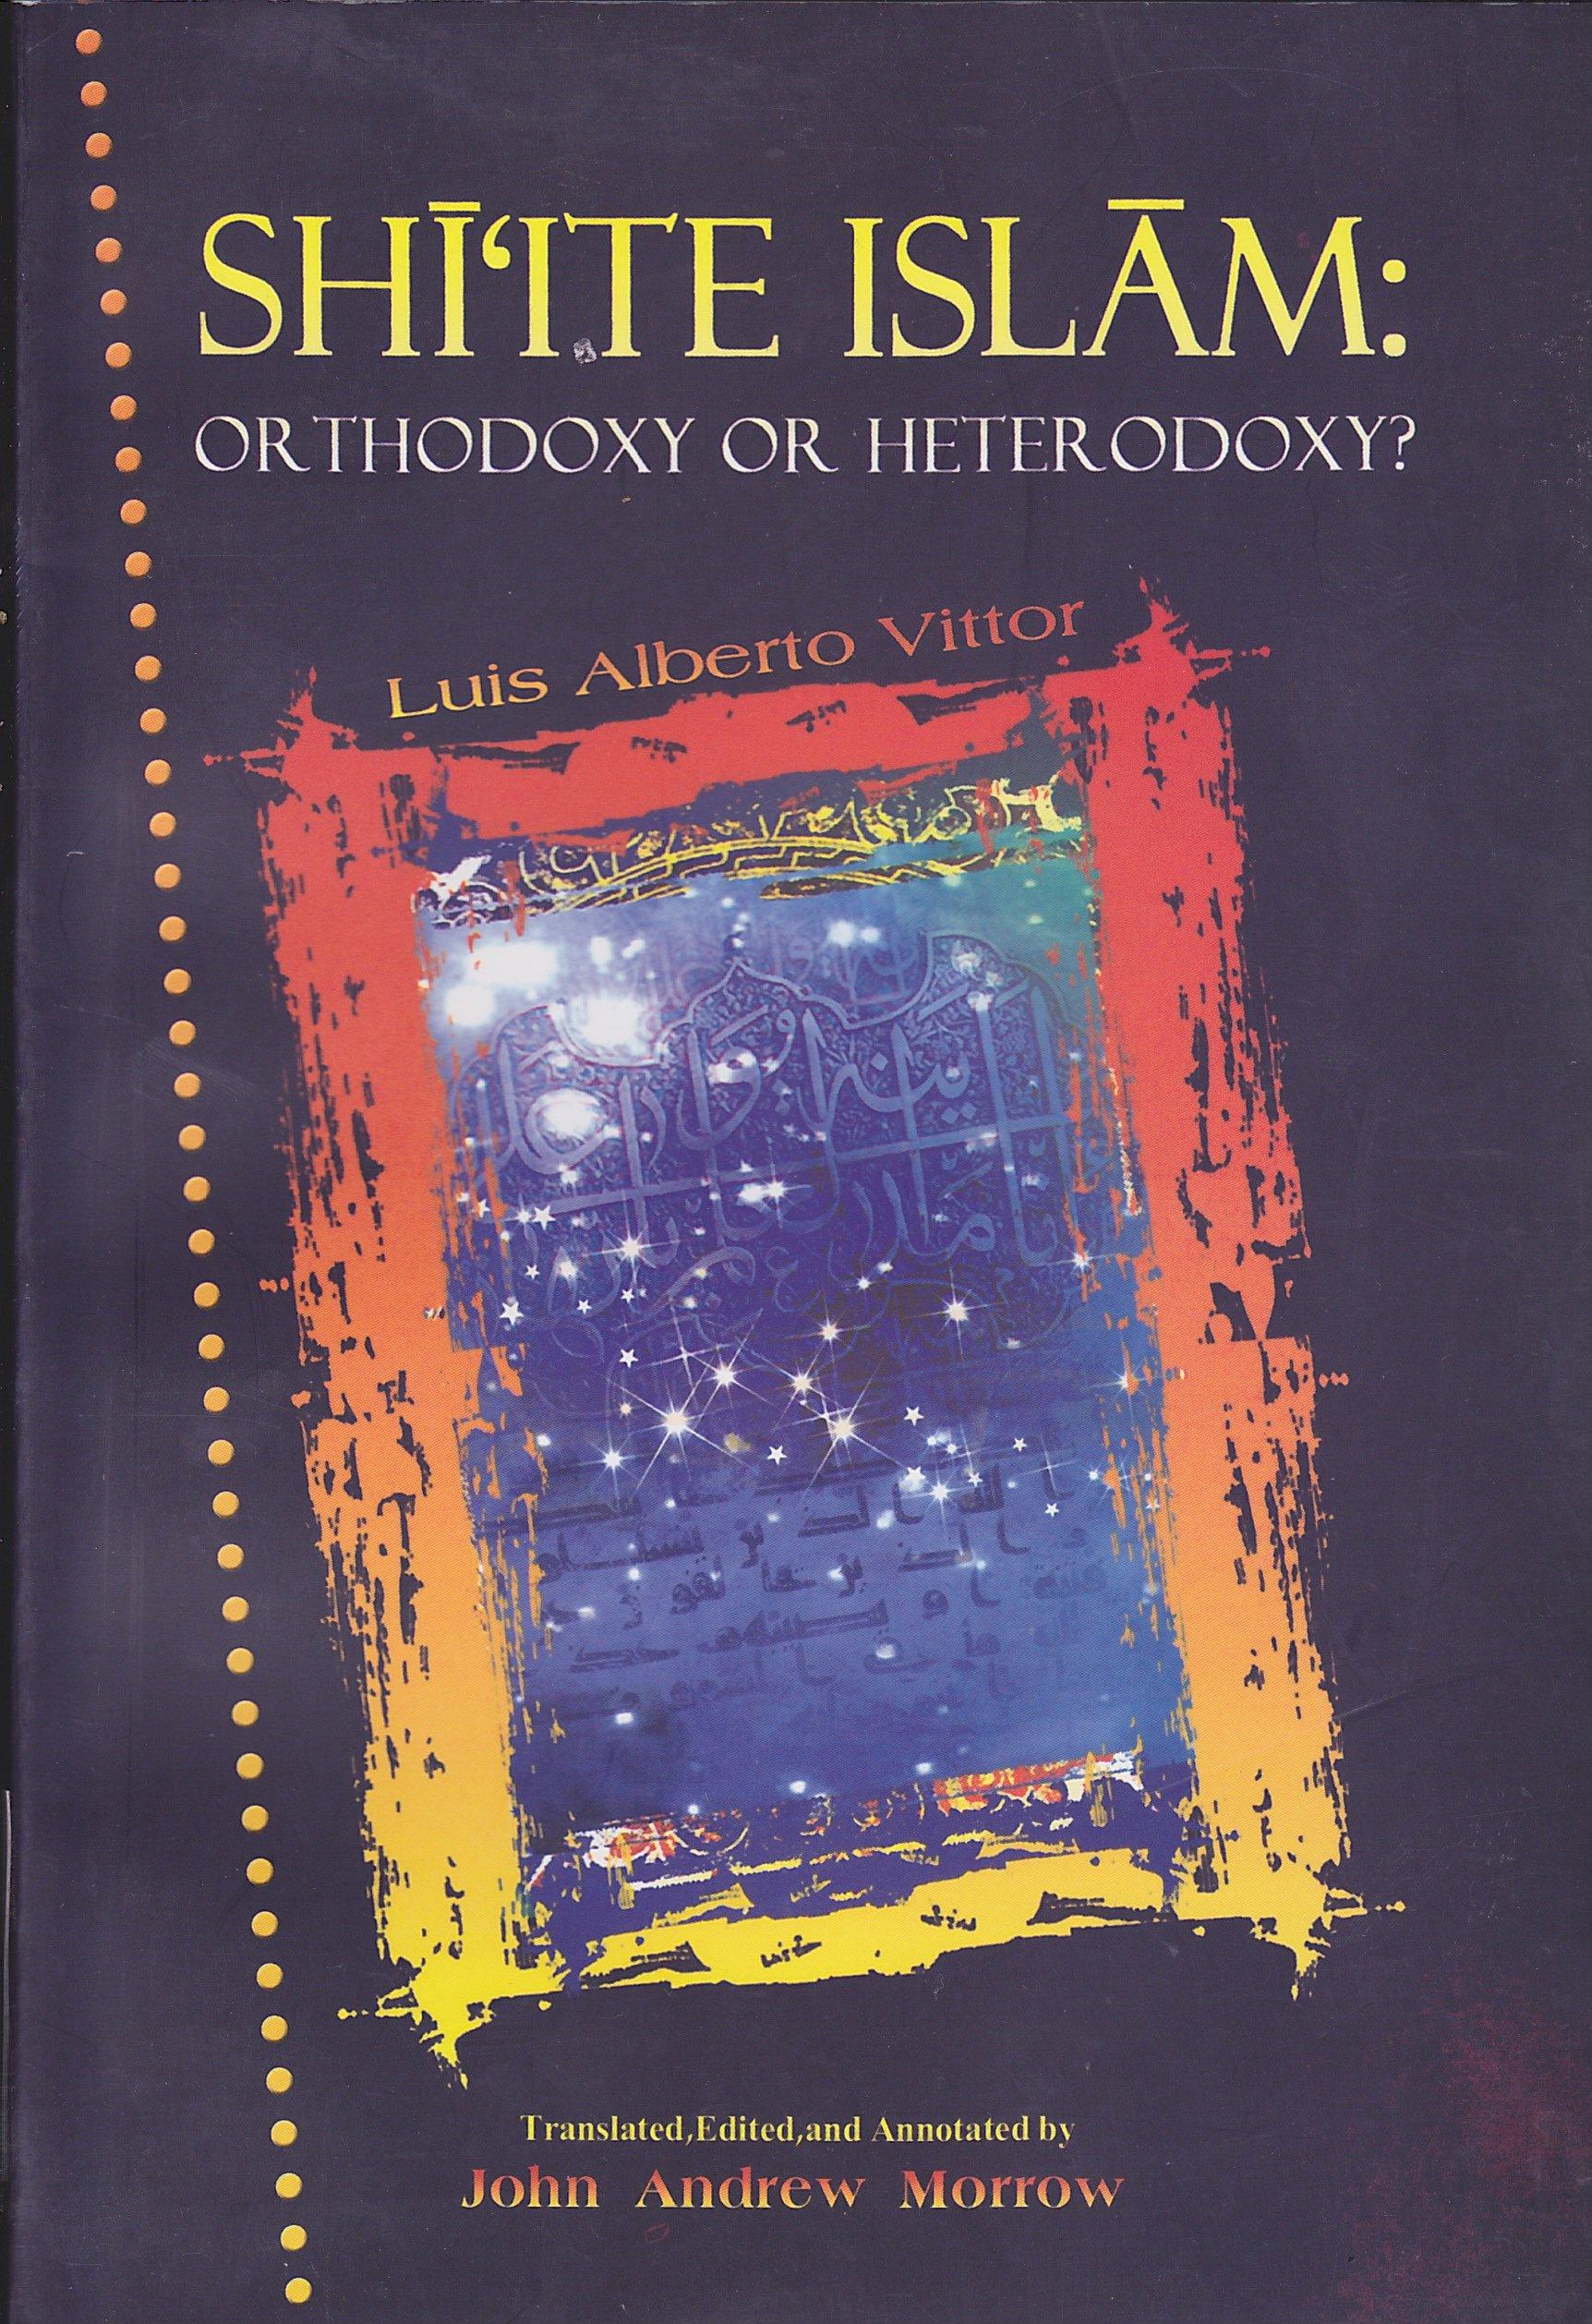 Image result for ORTHODOXY OR HETERODOXY VITTOR